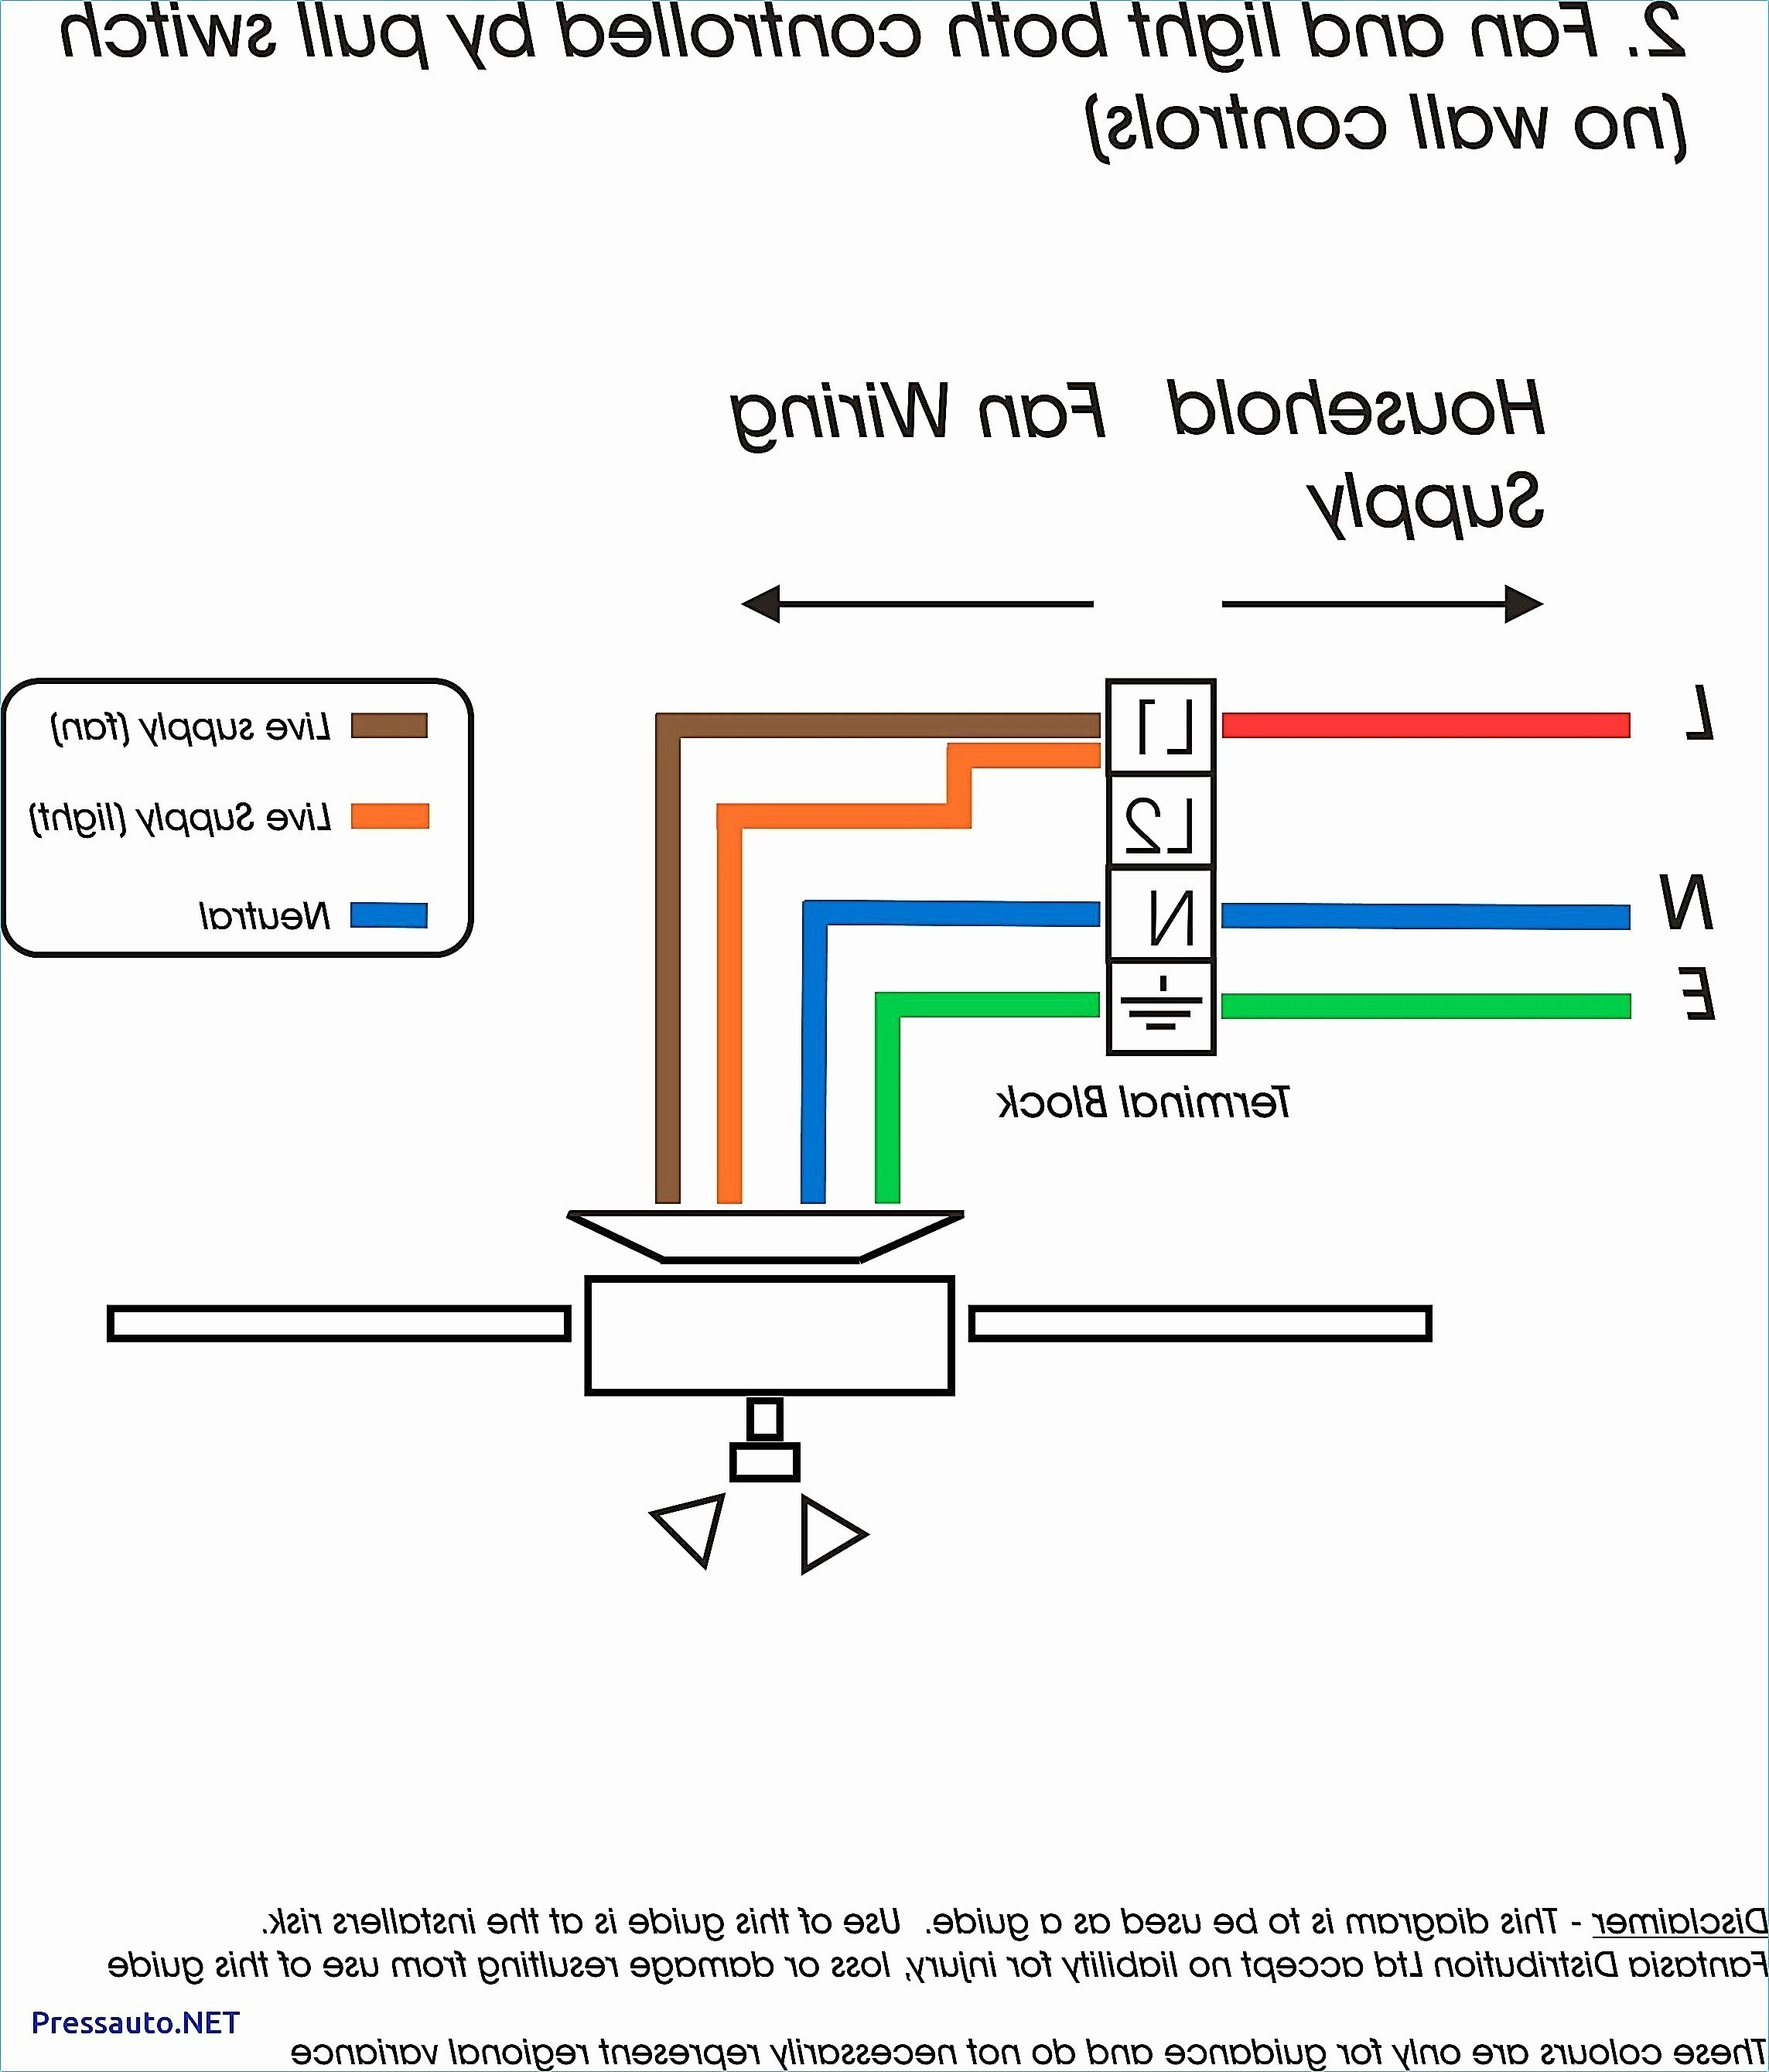 murray switch wiring wire center \u2022 murphy switch wiring diagram 518ph12 murray lawn mower ignition switch wiring diagram wiring diagram image rh mainetreasurechest com basic switch wiring murphy switch wiring manual shut off